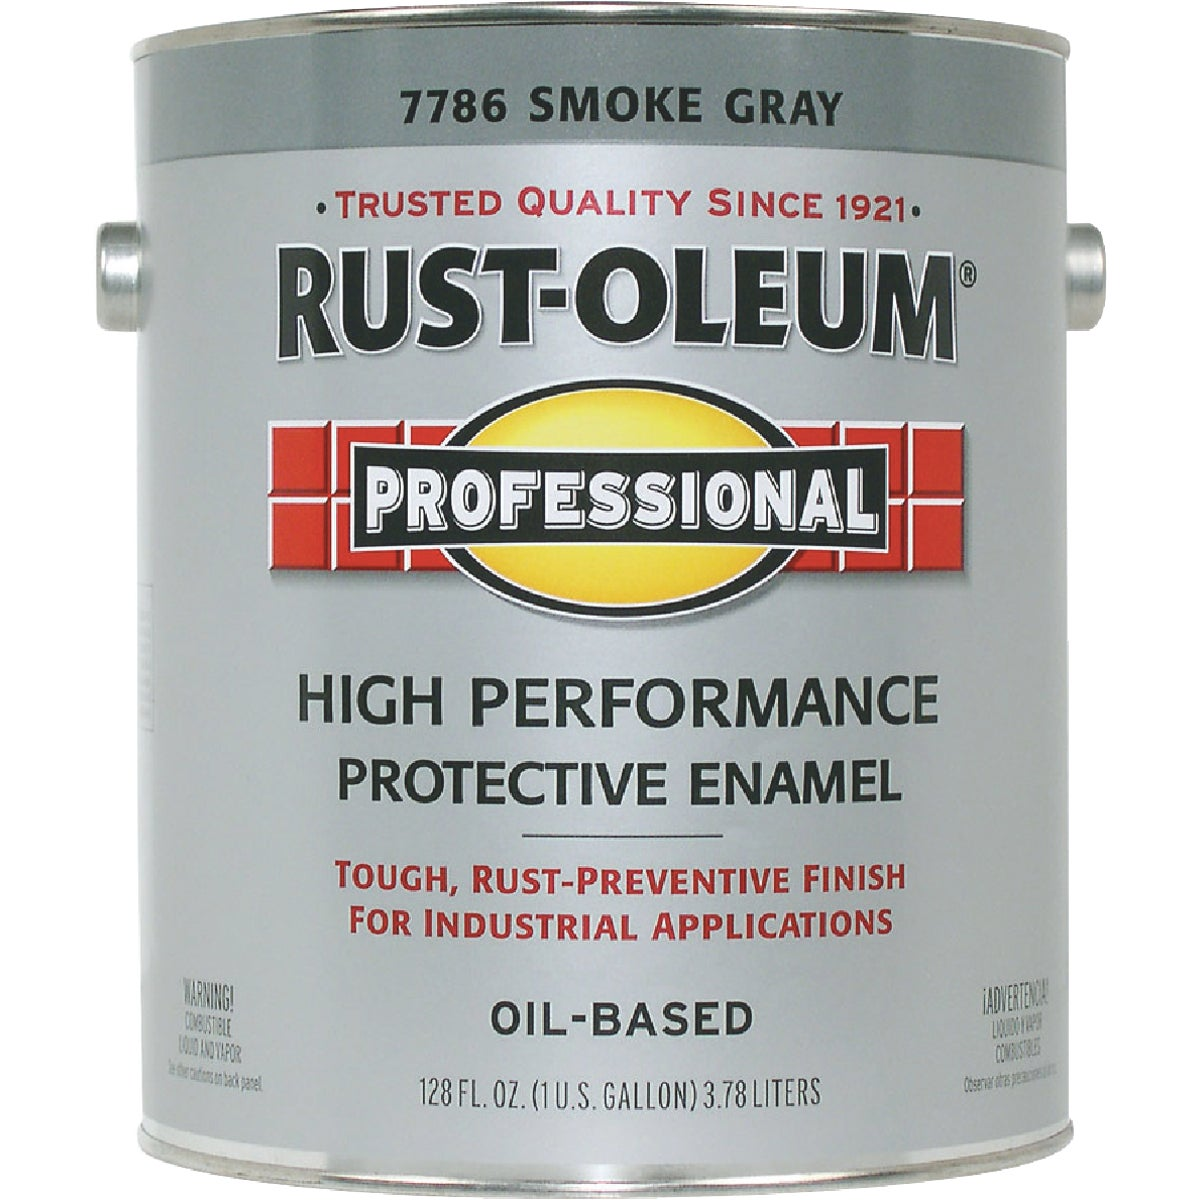 VOC SMOKE GRY PRO ENAMEL - K7786 by Rustoleum